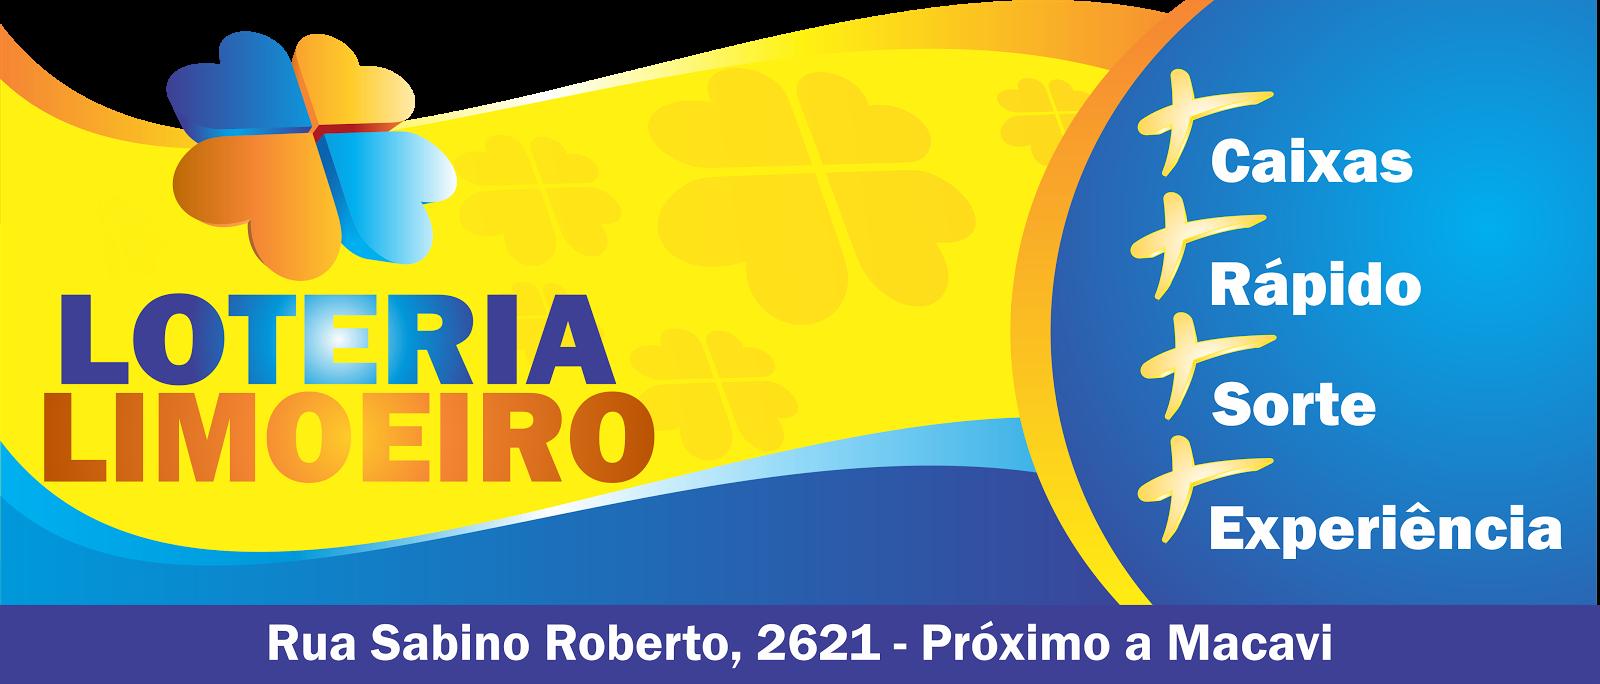 LOTERIA LIMOEIRO